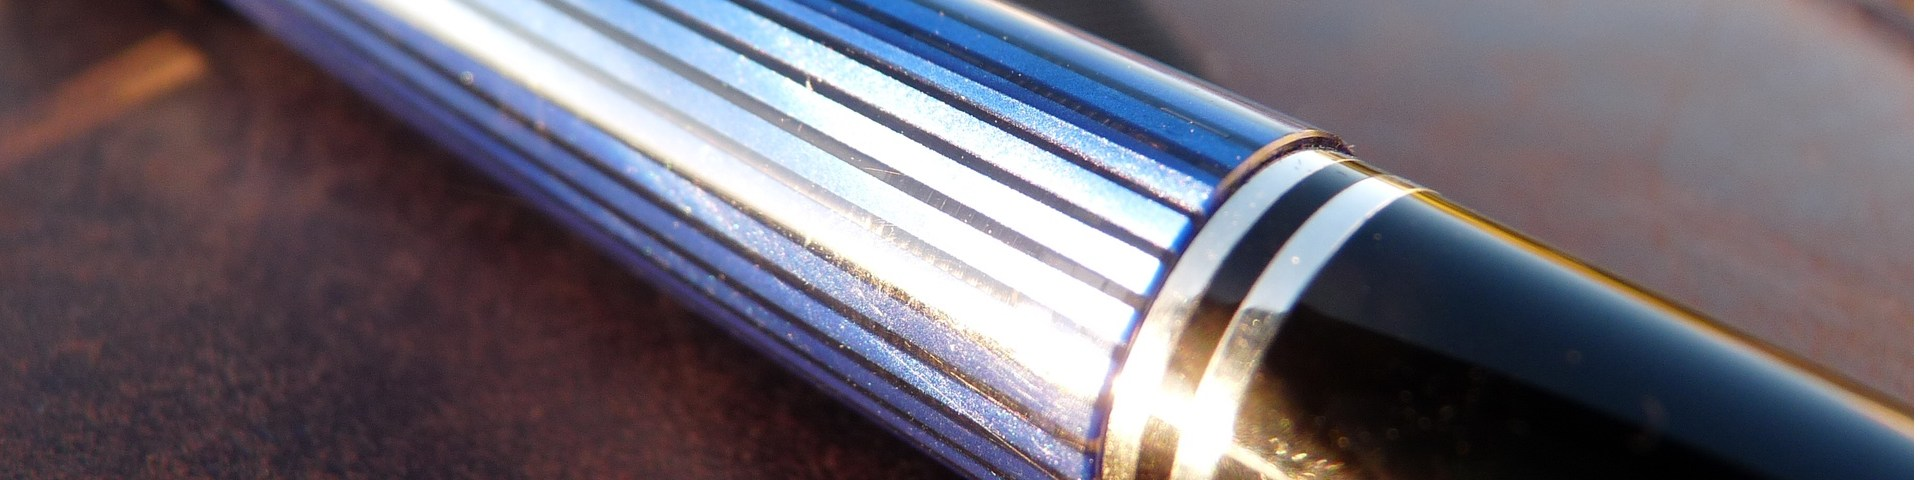 Pelikan M805 featured